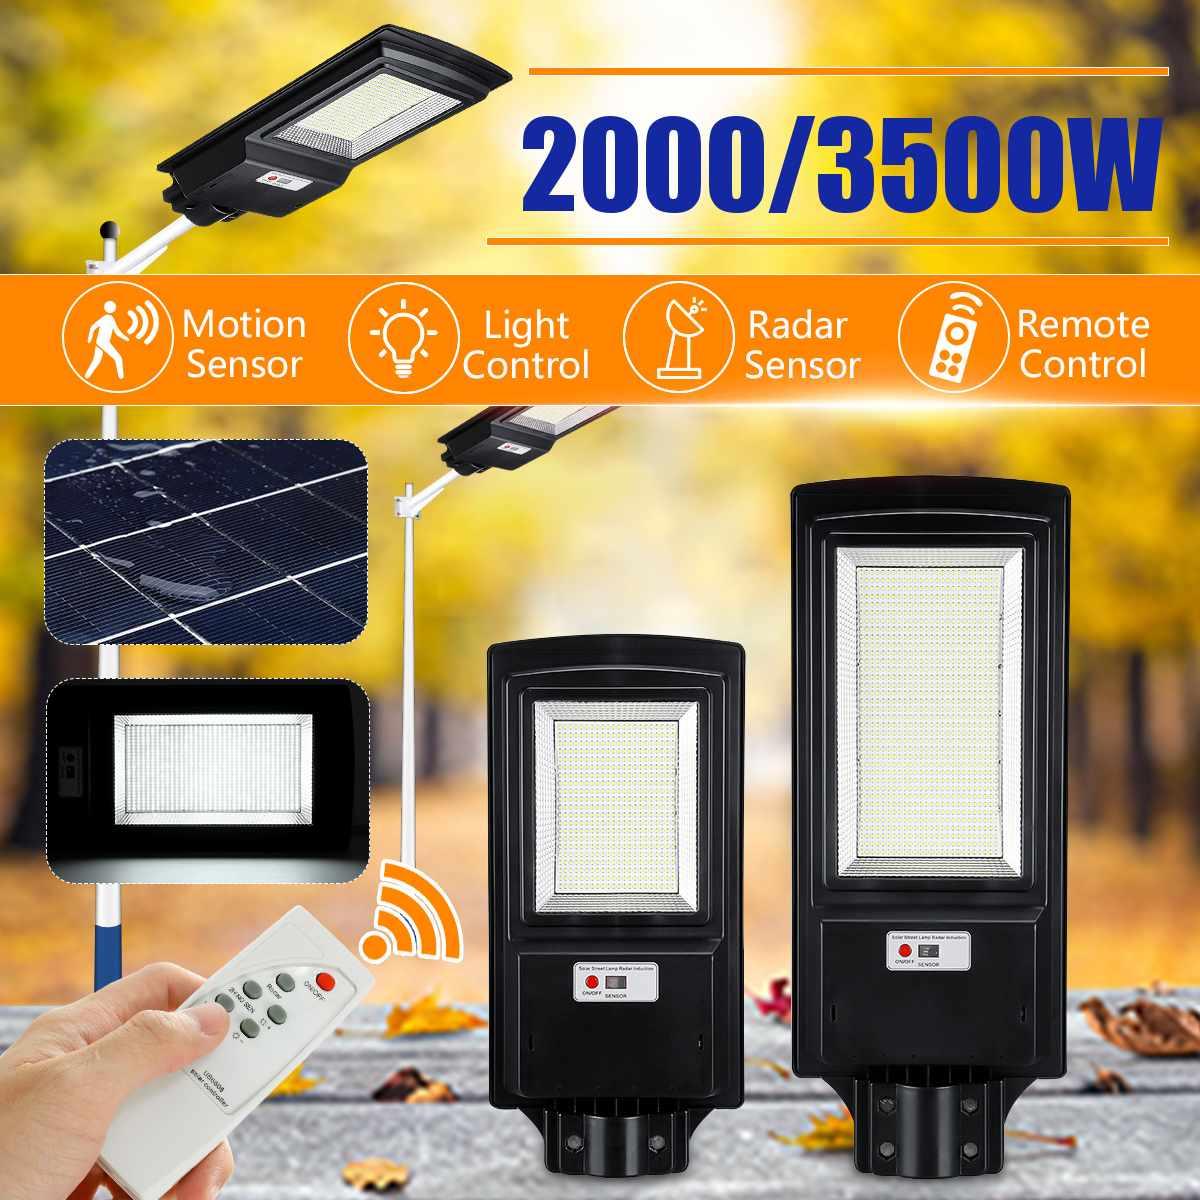 2000W 3500W LED Solar Straße Licht 2835smd Radar Sensor Super Helle 436led/936led Remote Solar Lampe für plaza und Pathway